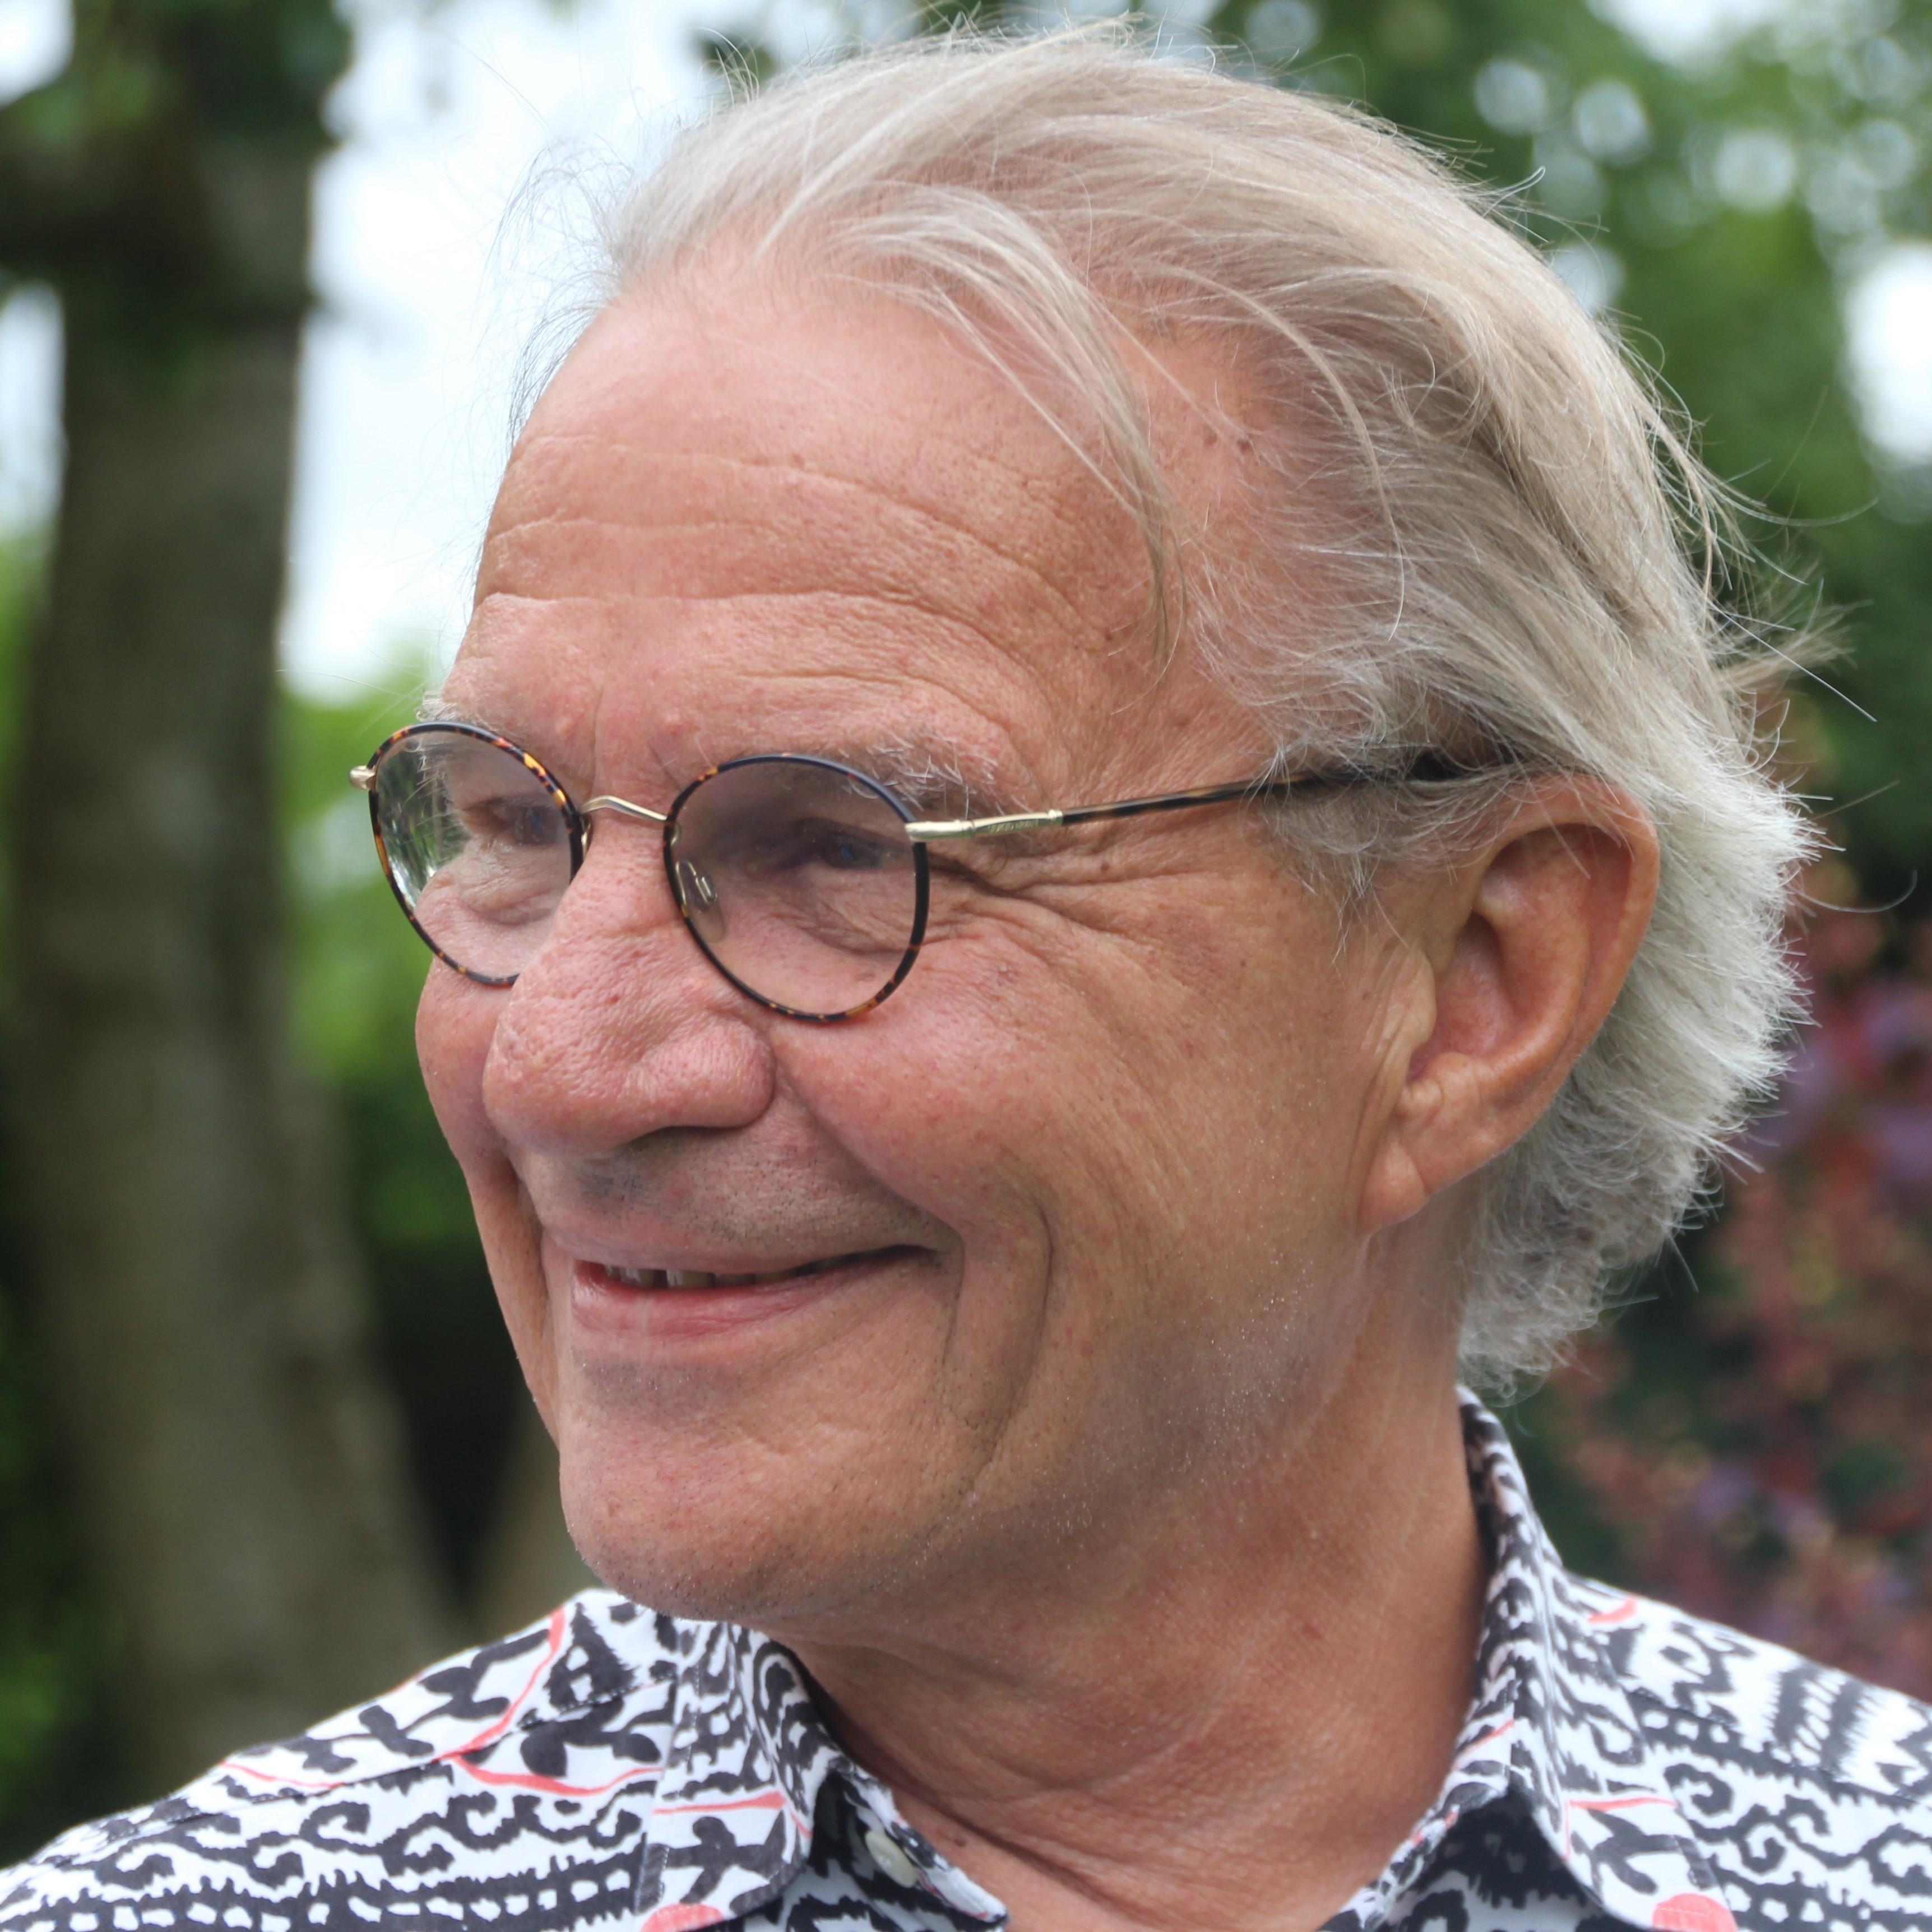 Søren Nipper